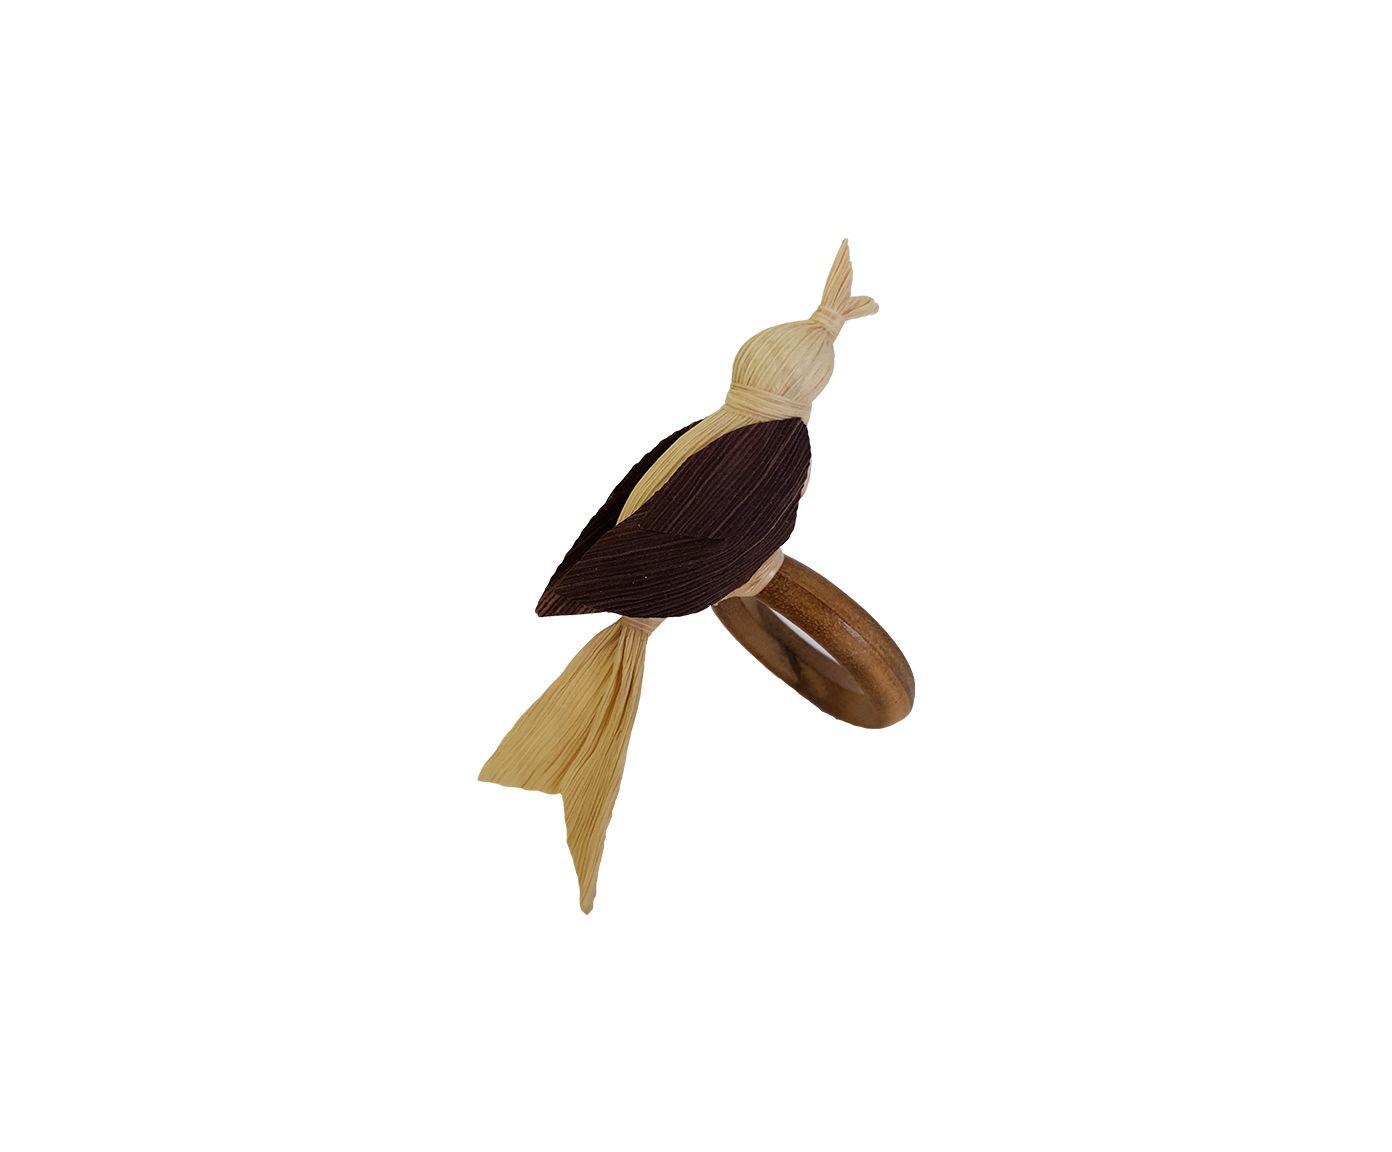 Anel para Guardanapo Pássaro Palha Bege - 6cm | Westwing.com.br